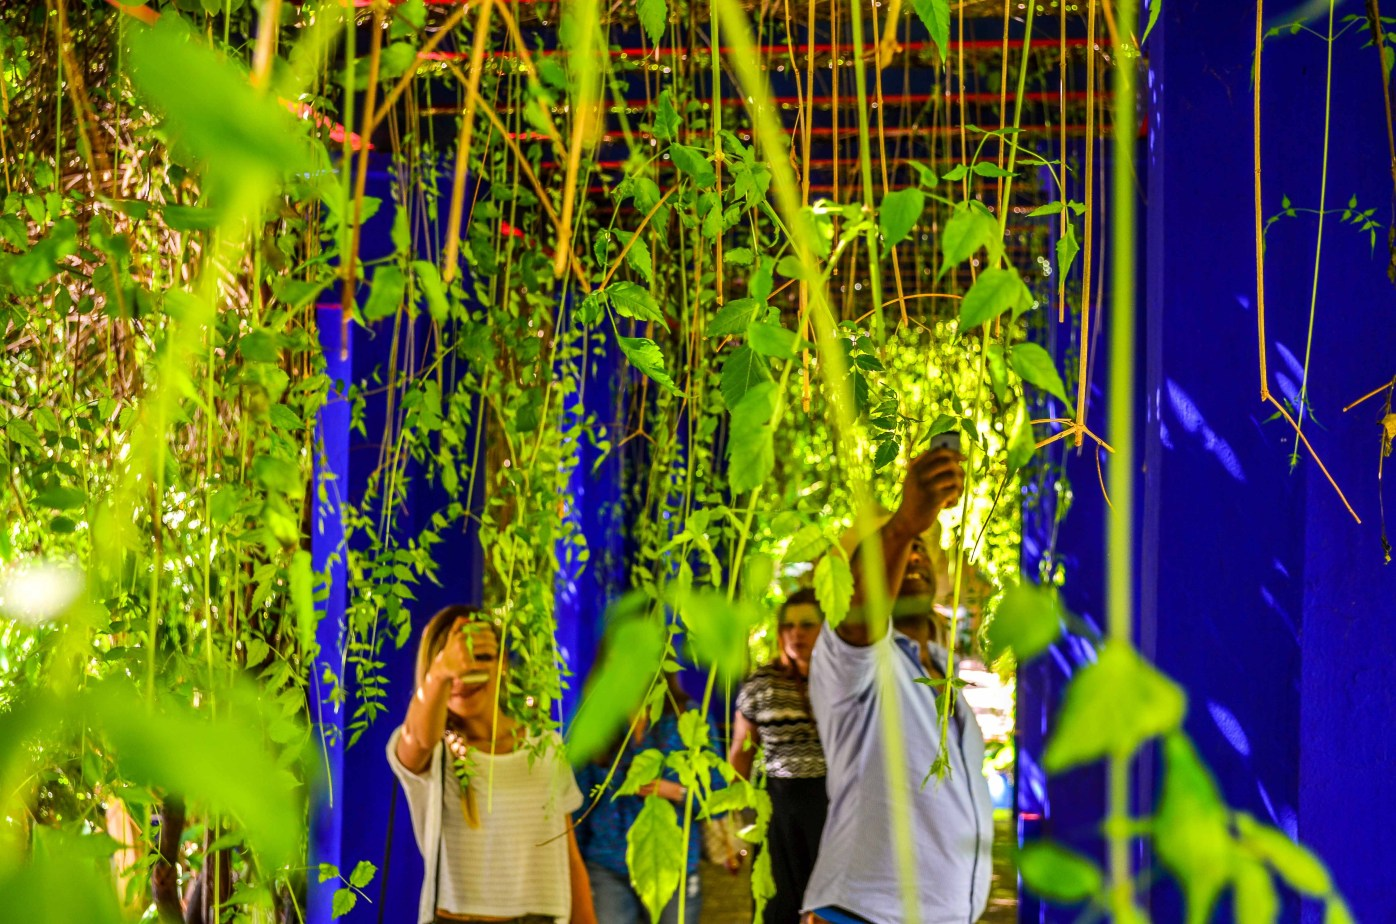 Marrakech Jardin Majorelle BleuMajorelle Bleu Mémorial Yves Saint Laurent blog blogvoyage voyage icietlabas